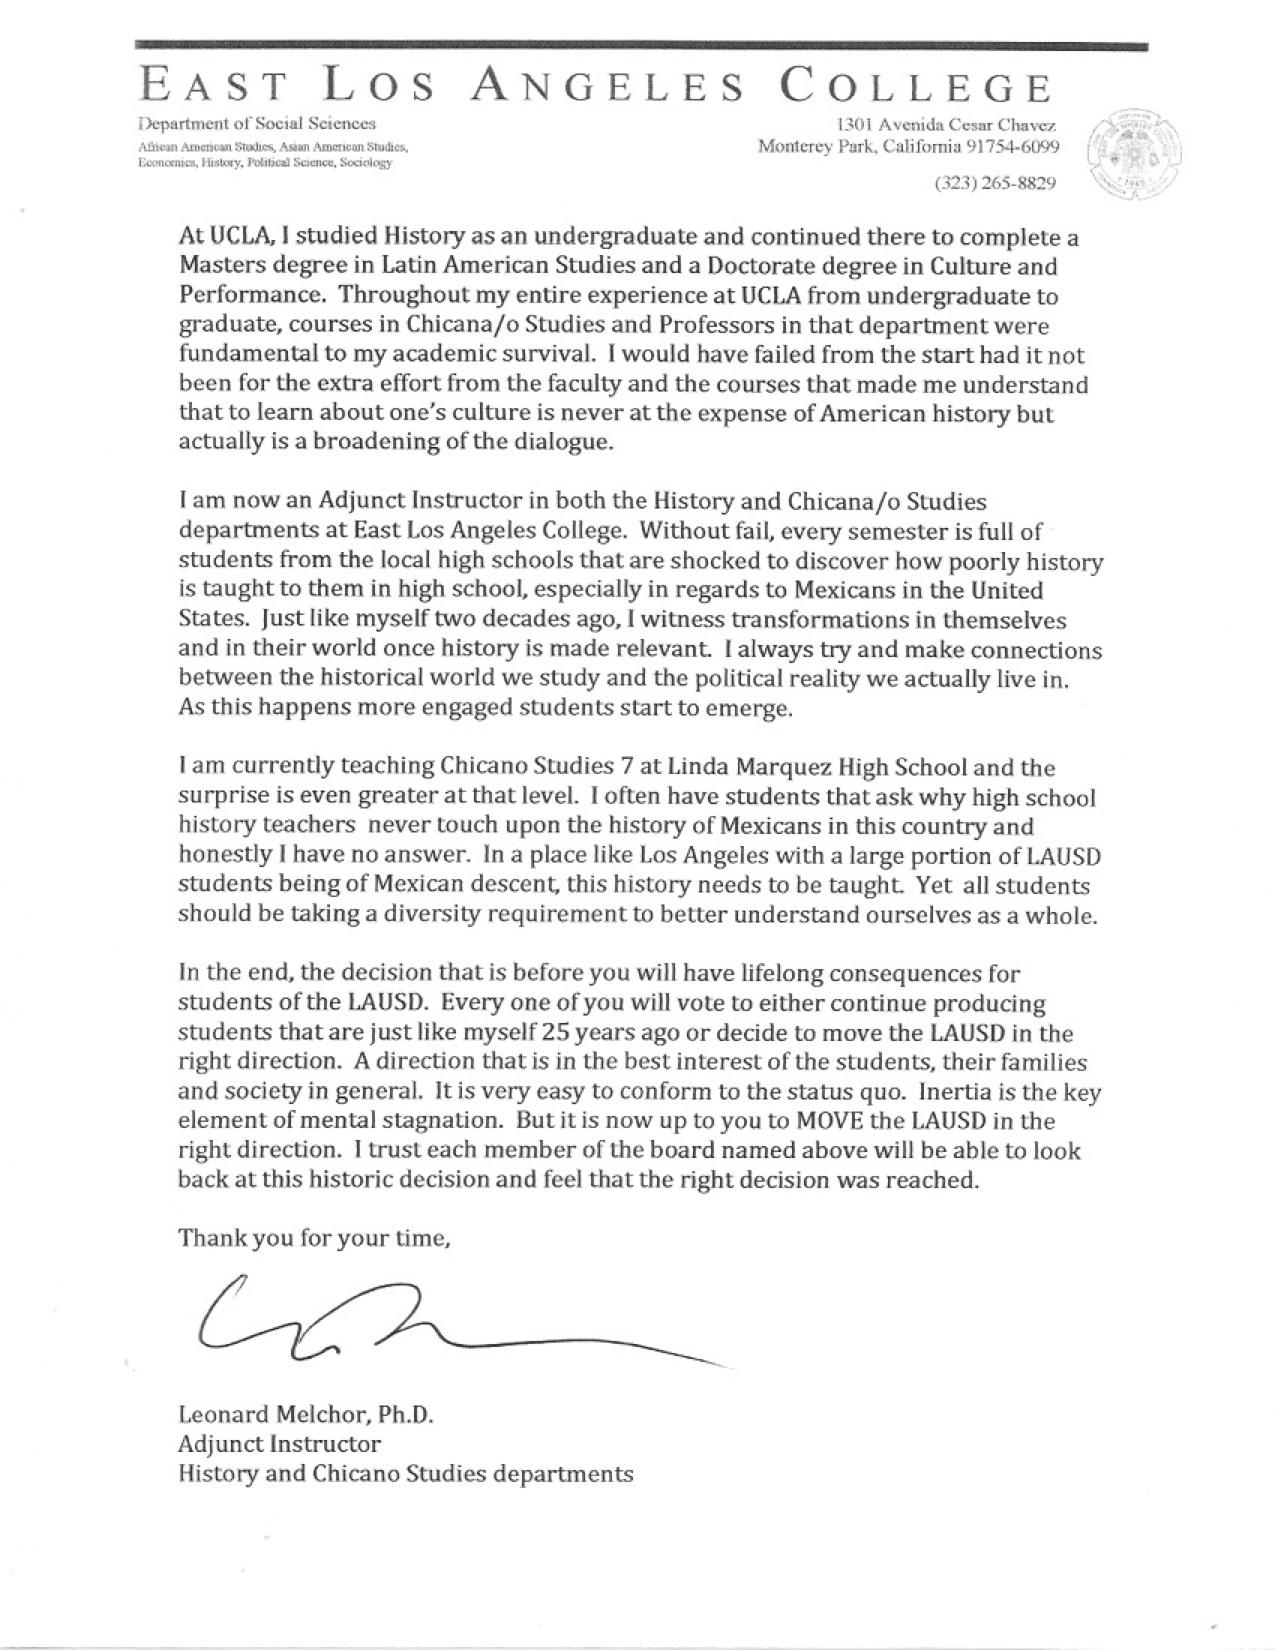 Letter_to_Board_ELAC_Prof_Leonard_Melchor_p2.jpg